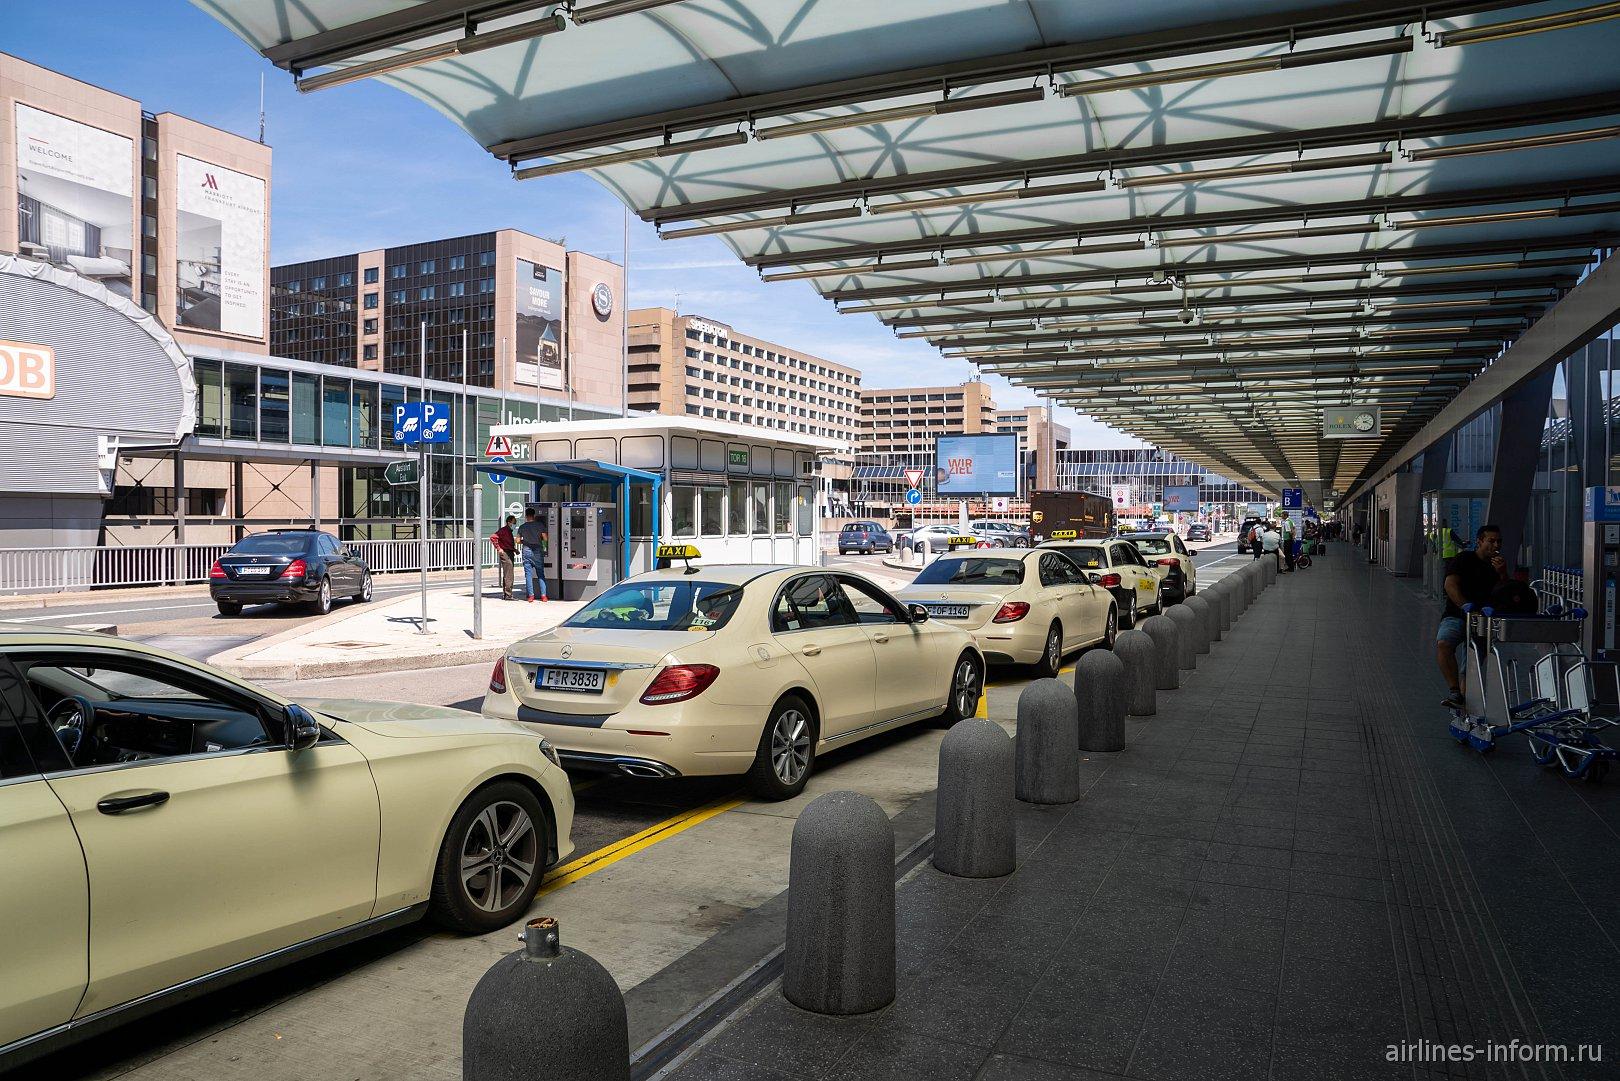 Такси у входа в терминал 1 аэропорта Франкфурт